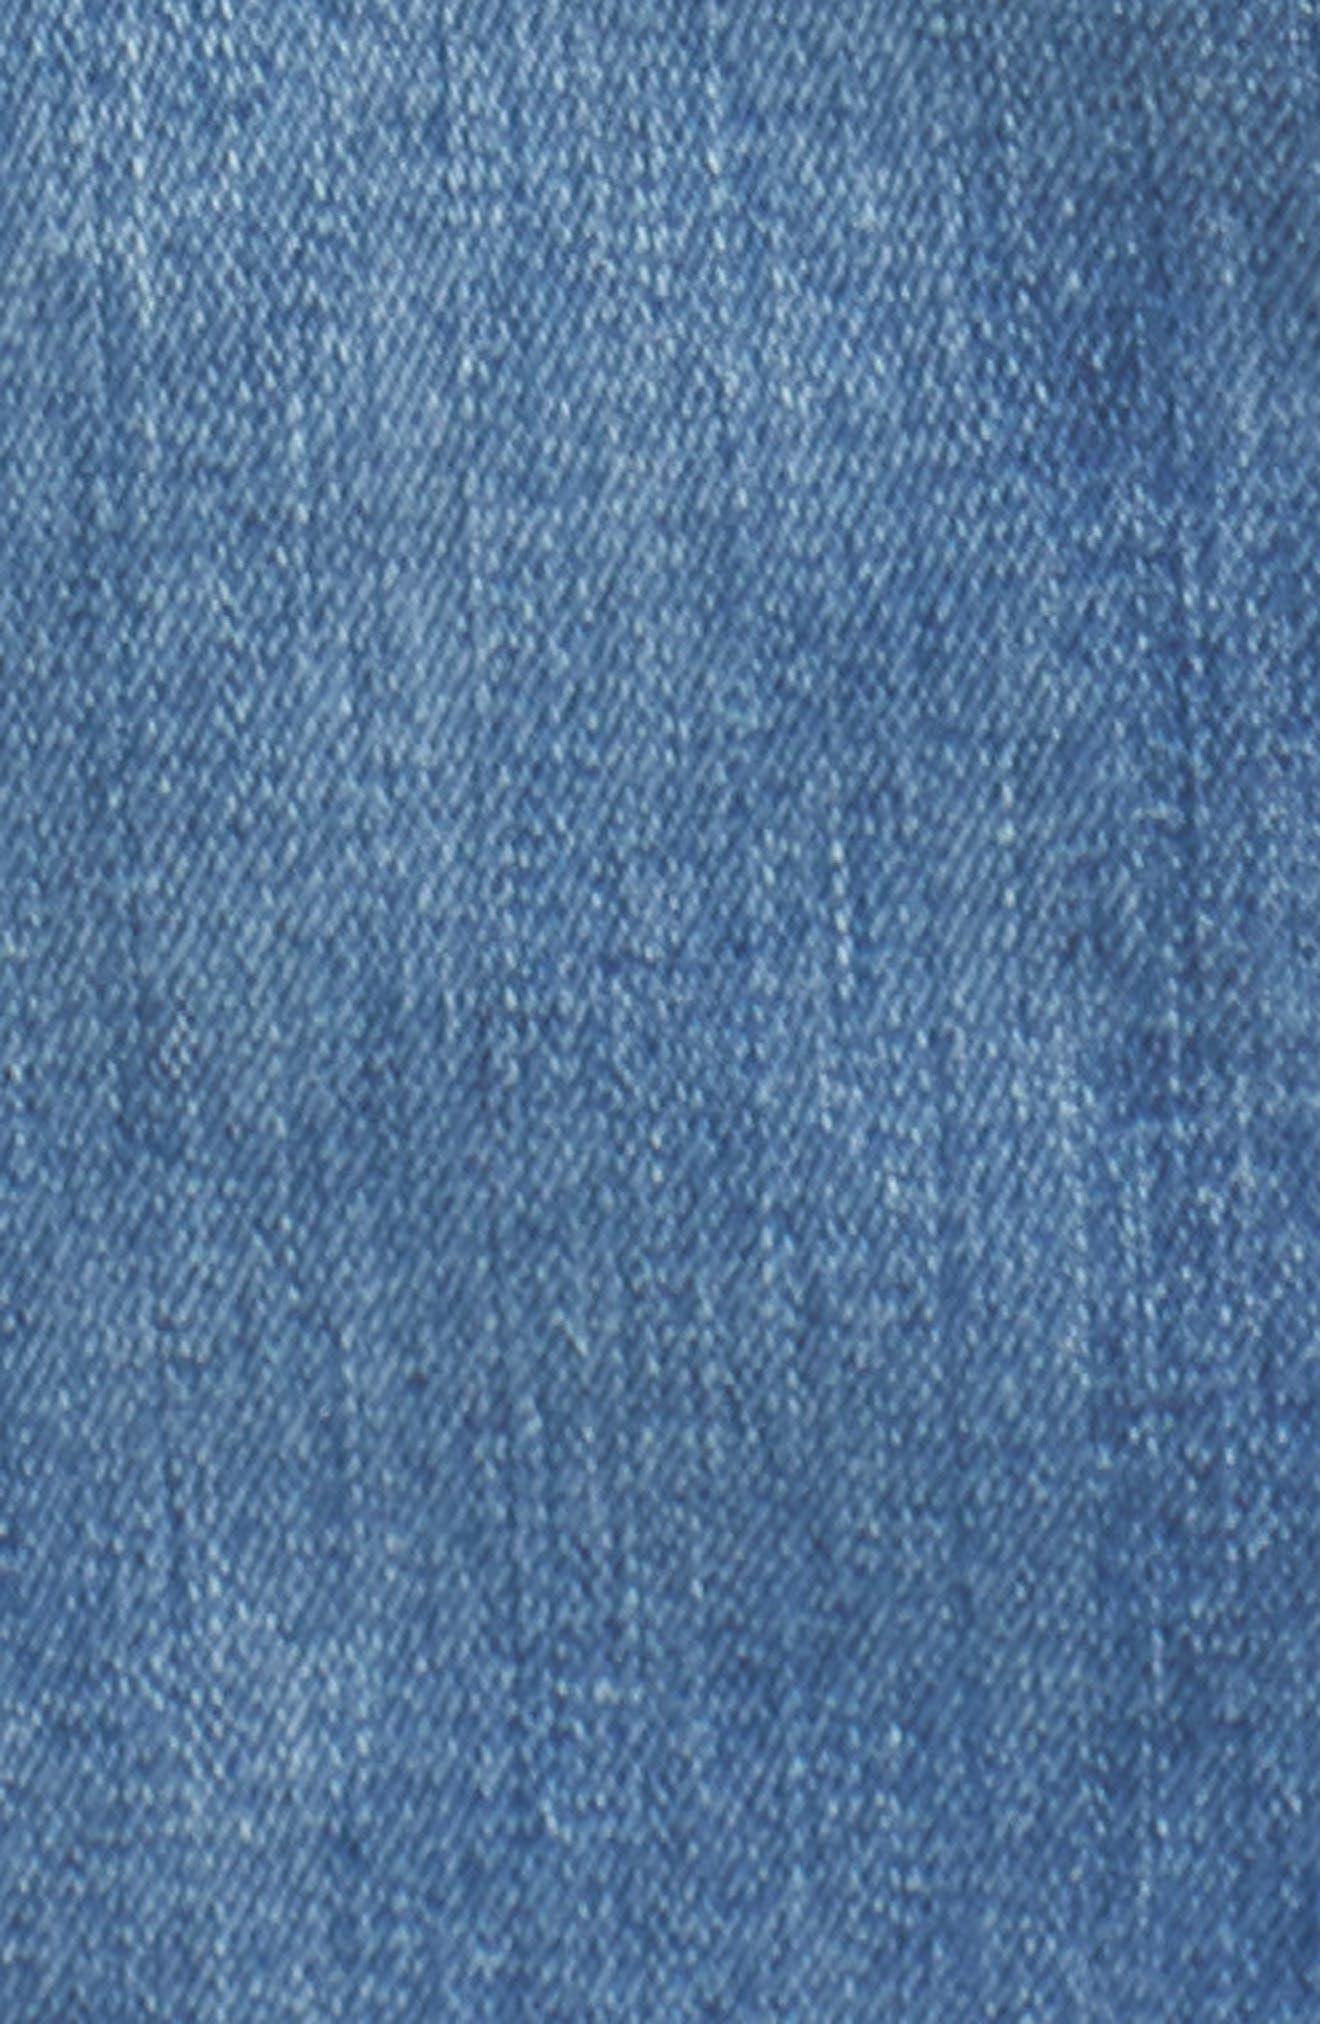 To the Point Denim Midi Dress,                             Alternate thumbnail 5, color,                             412